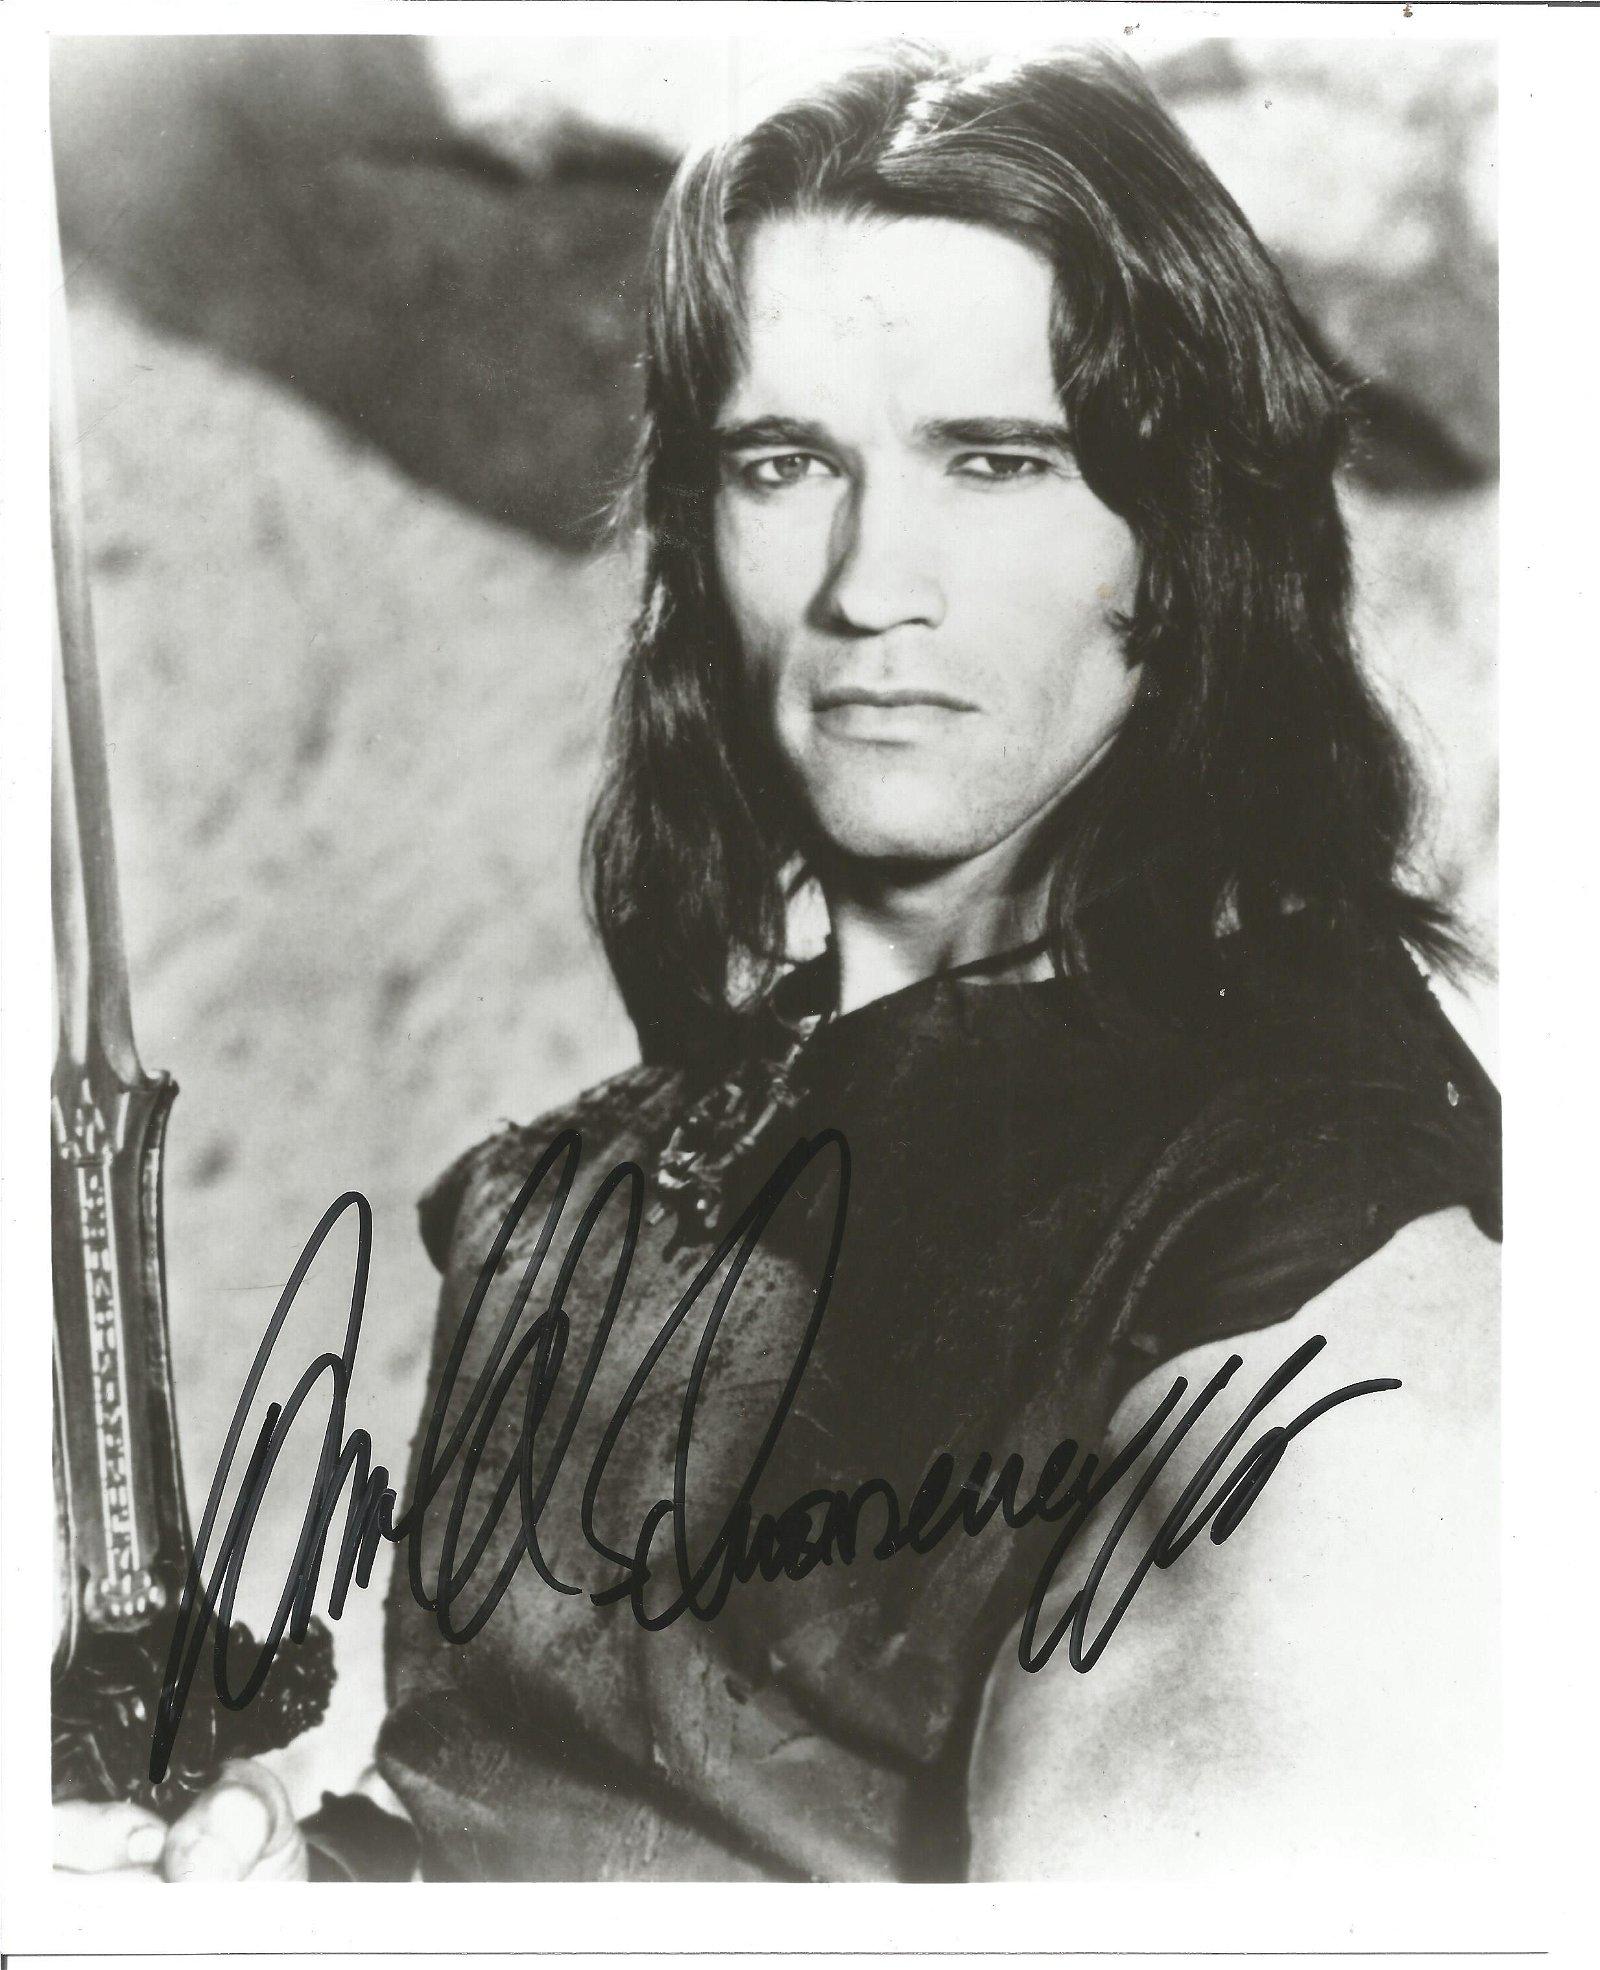 Arnold Schwarzenegger signed 10x8 black and white